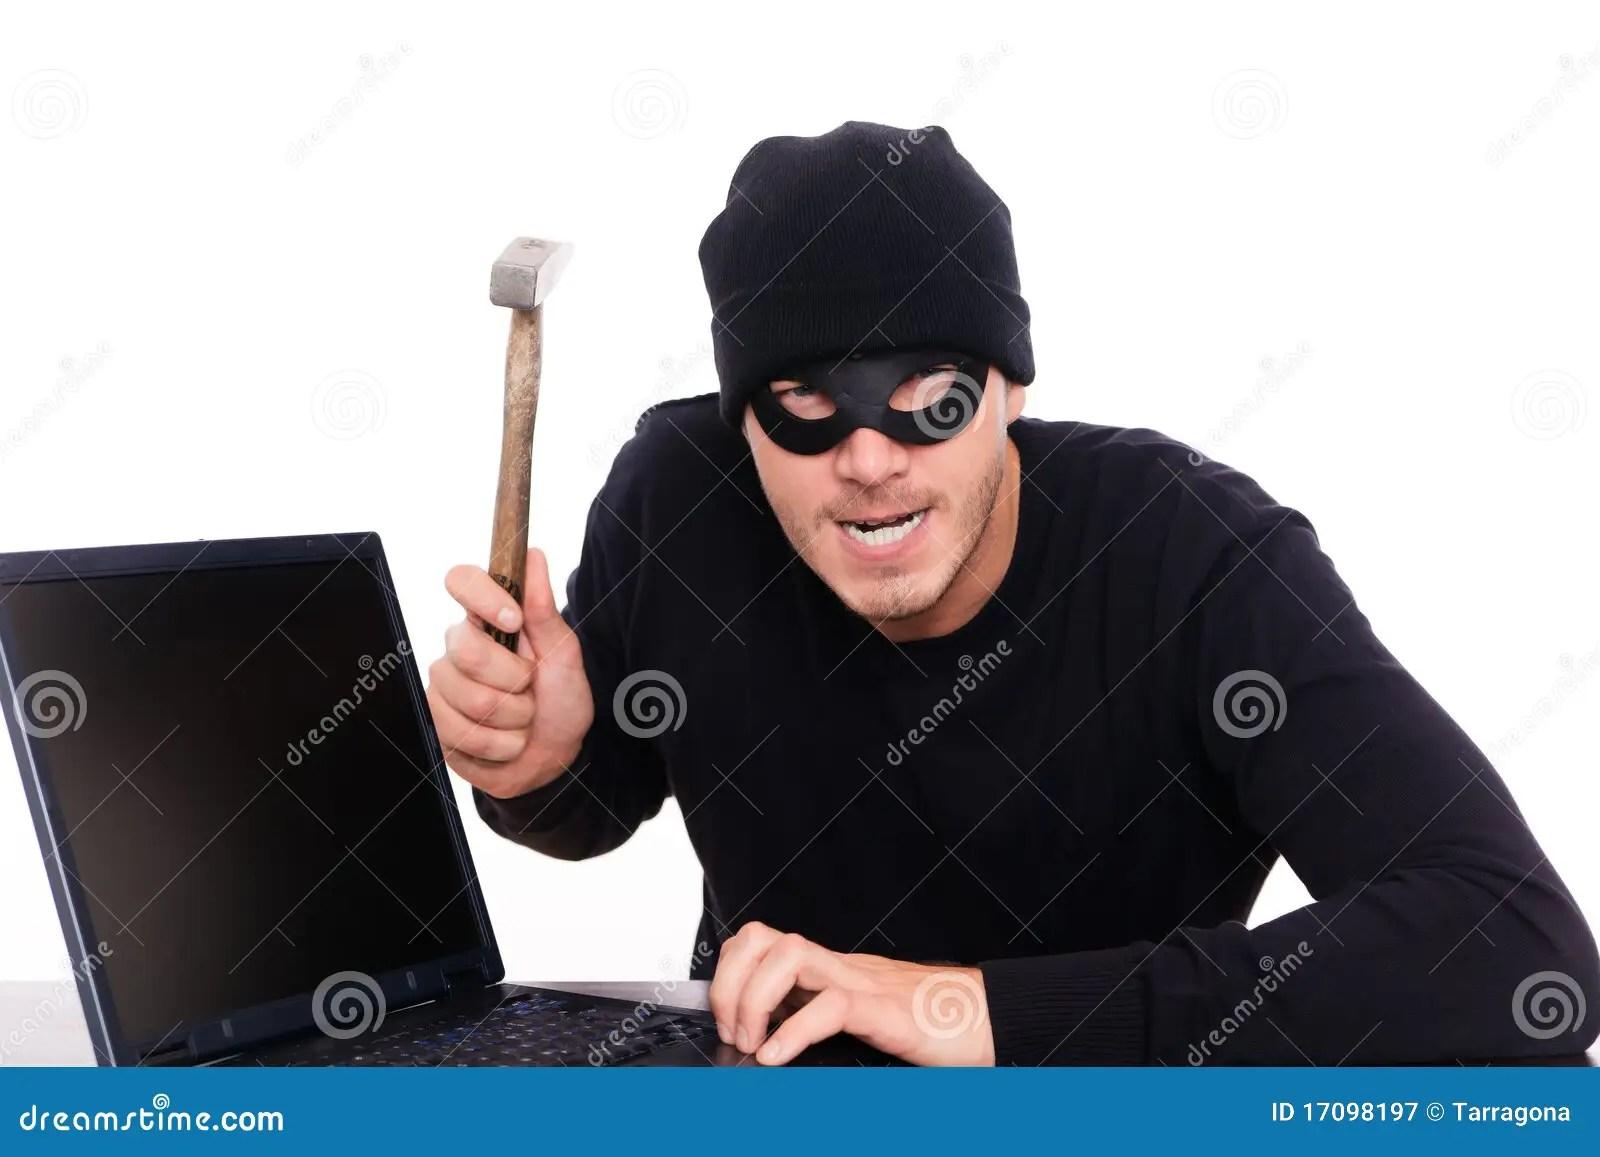 Web Security Architecture